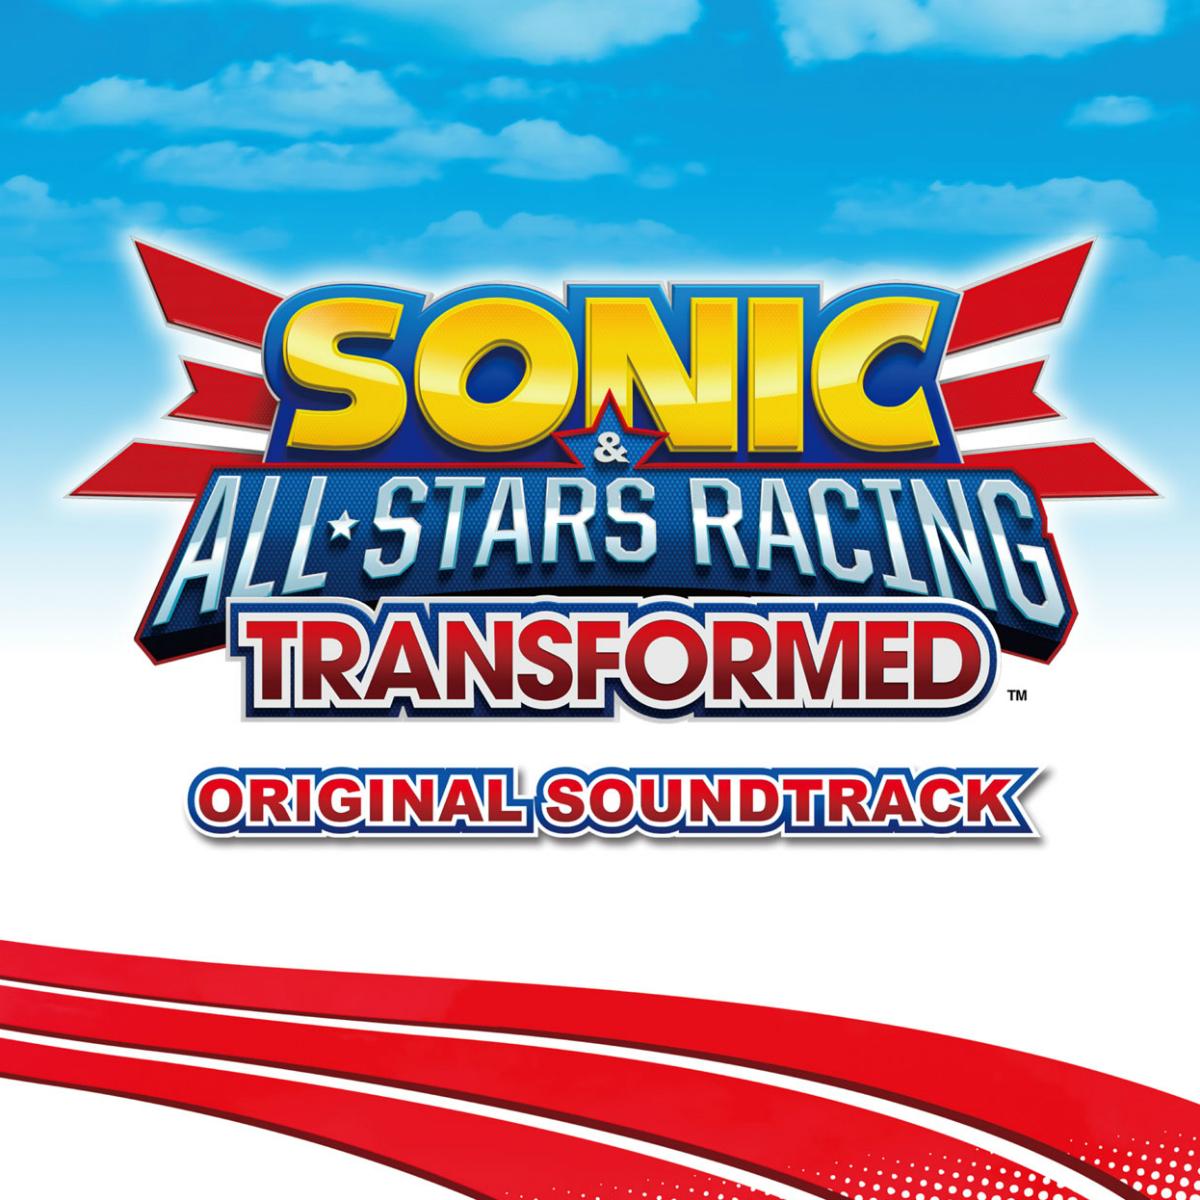 Sonic__All_Stars_Racing_Transformed_Original_Soundtrack__cover1200x1200.jpg